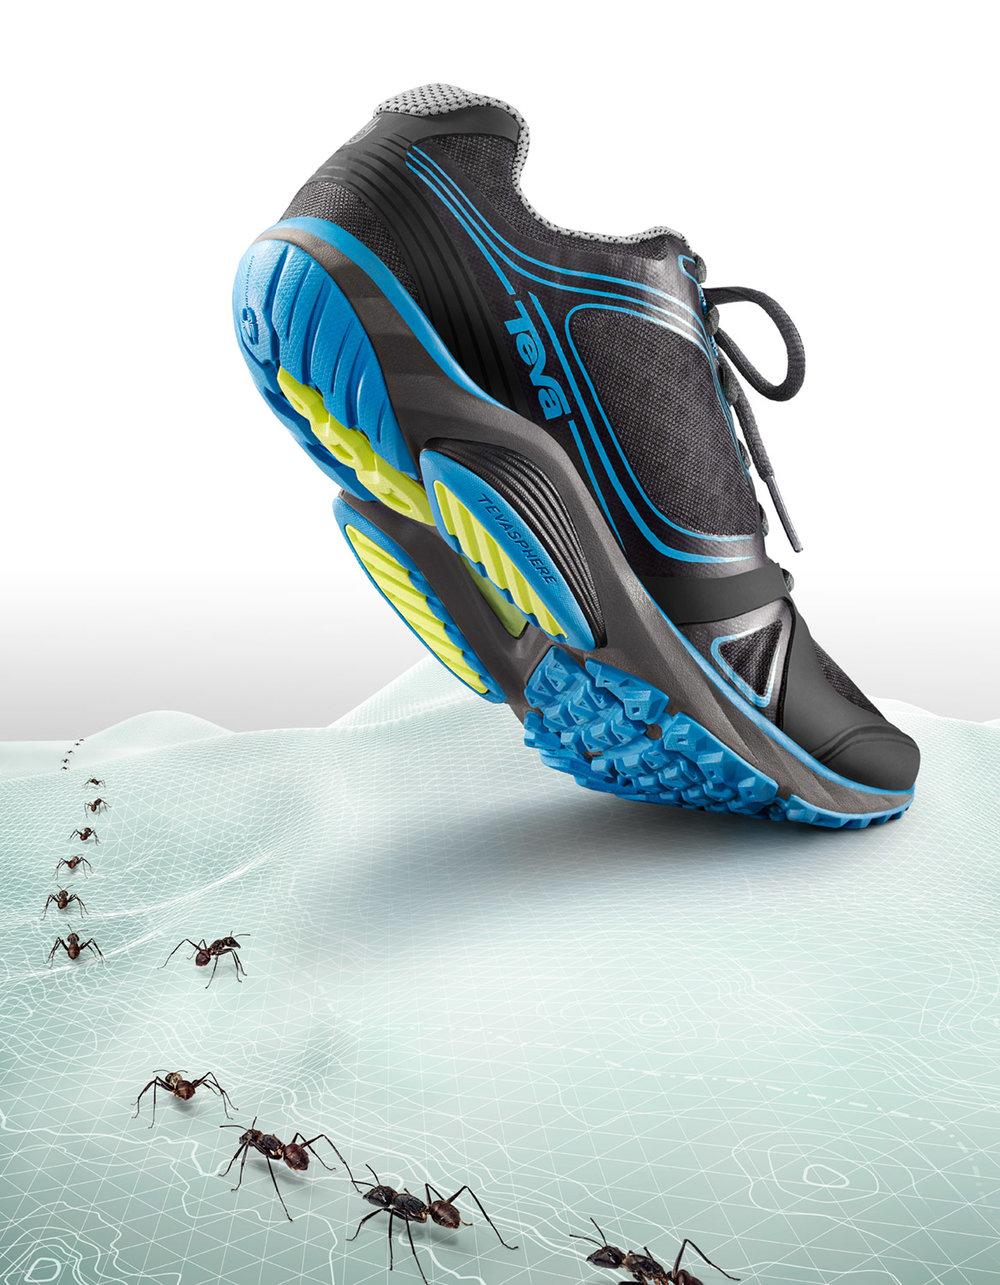 Retouched Blue TEVA Footwear